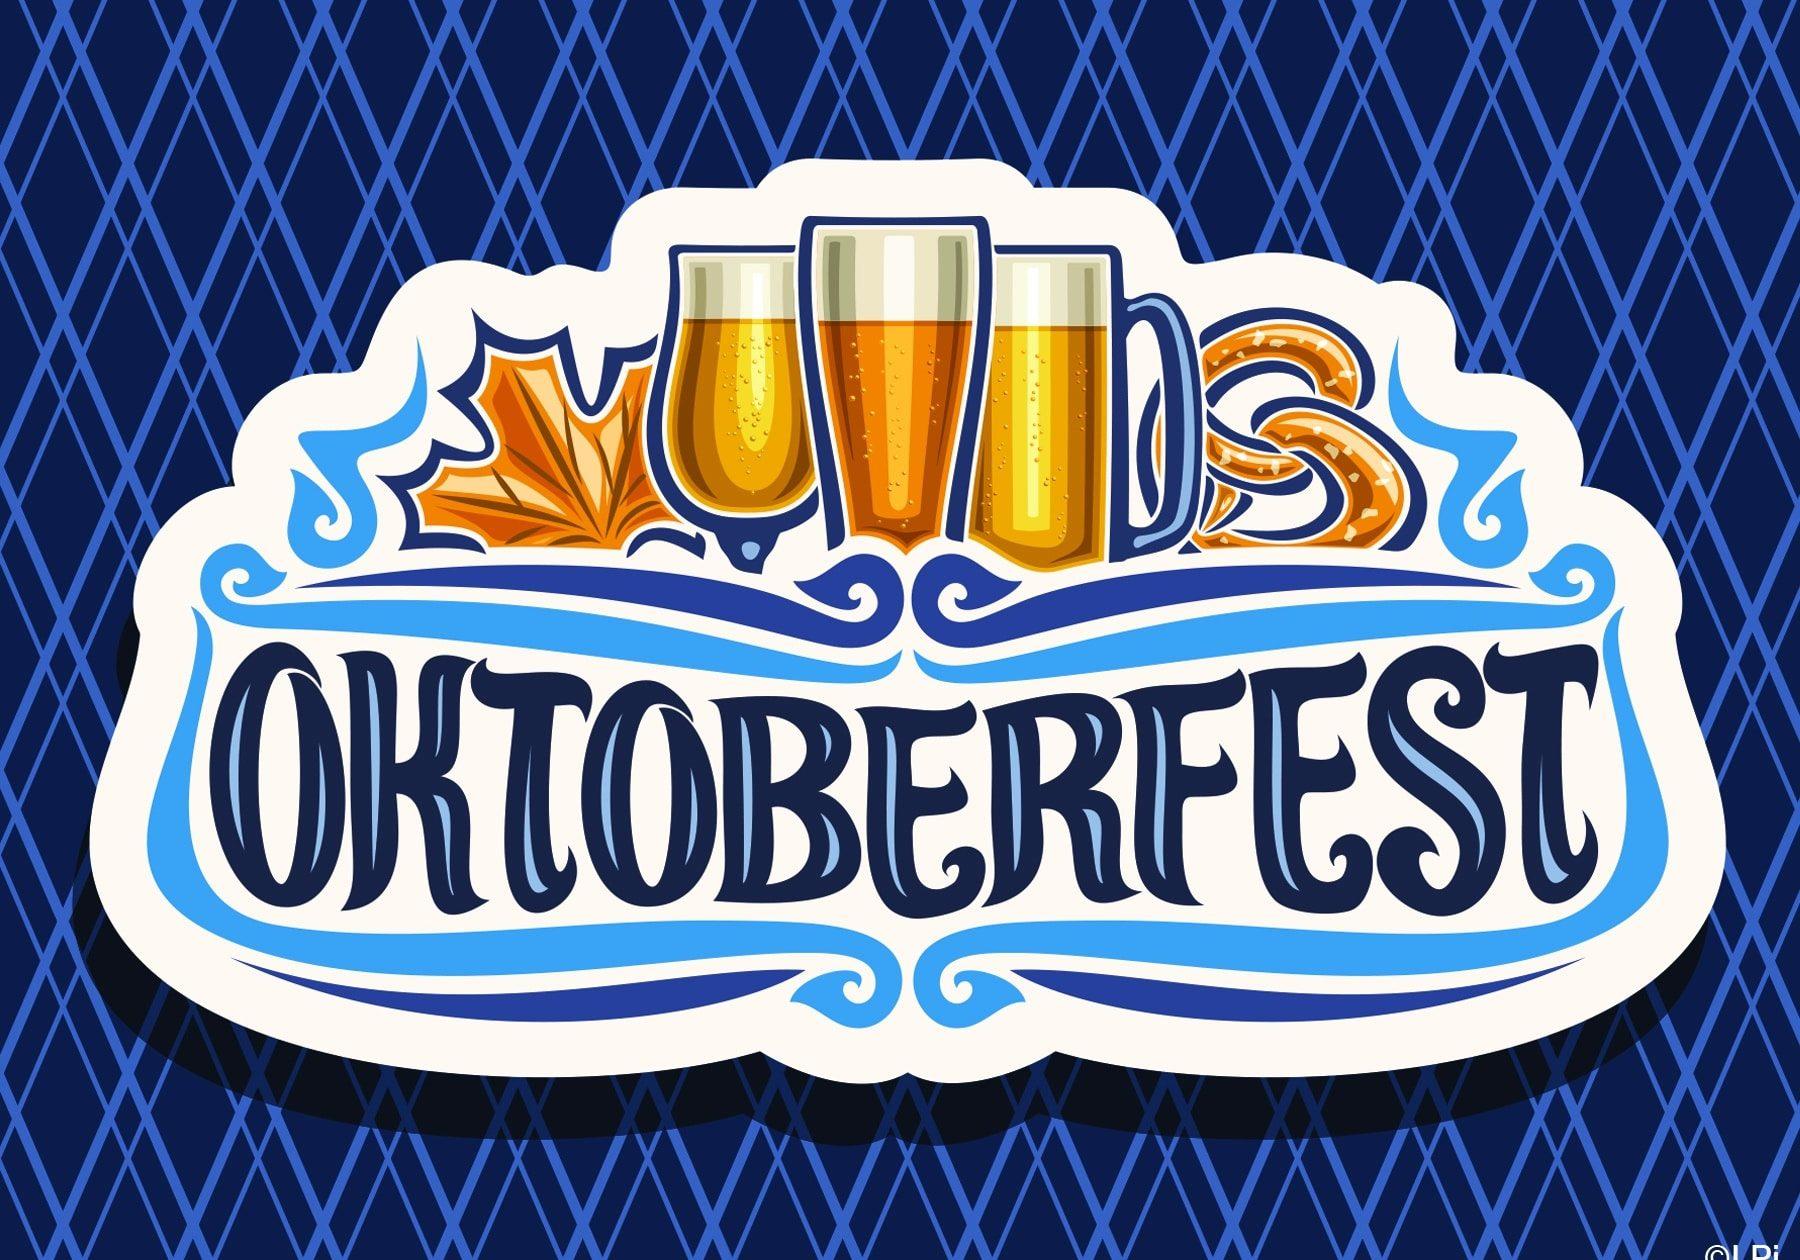 Octoberfest 4 19i4 4c